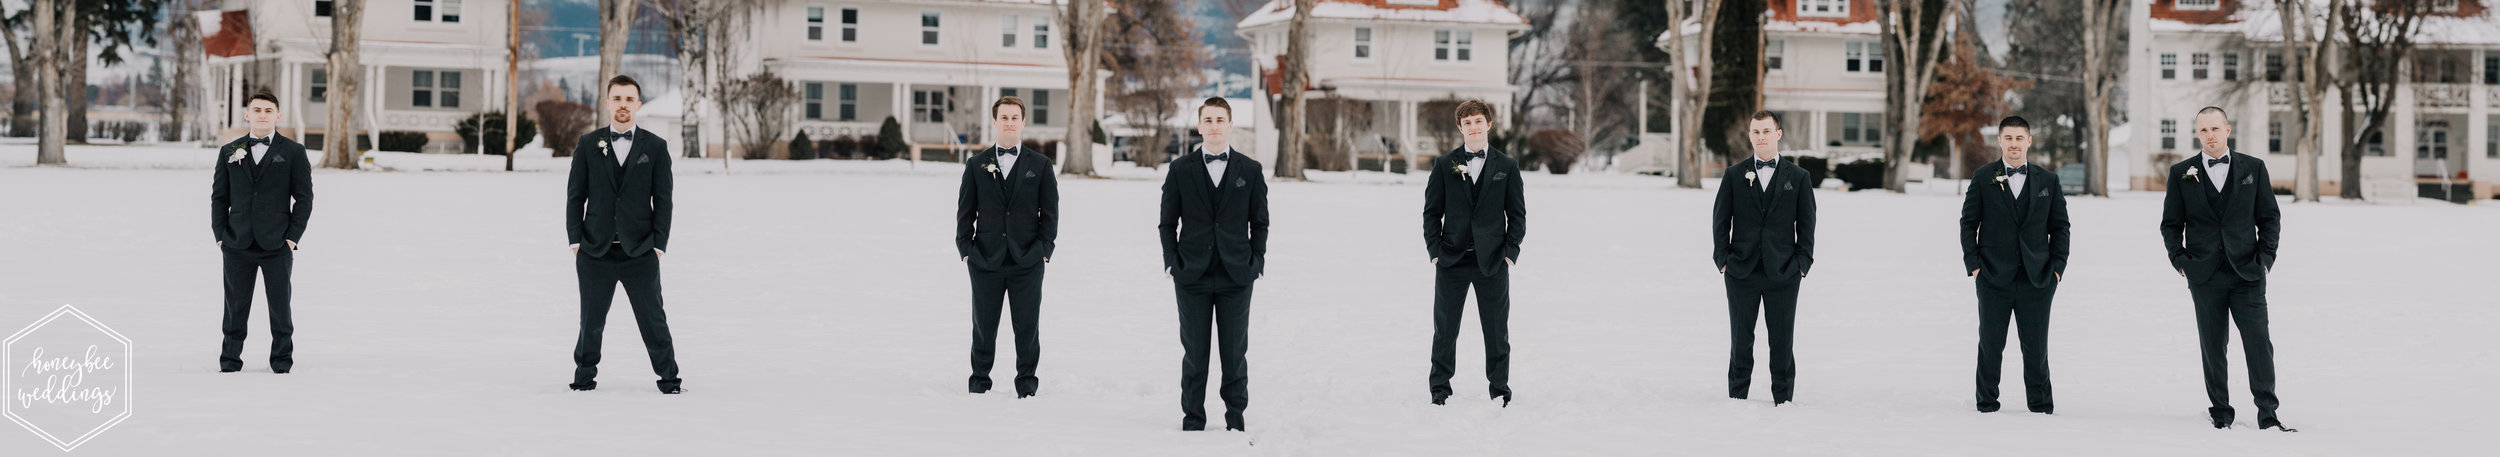 0157Montana Wedding Photographer_Montana winter wedding_Wedding at Fort Missoula_Meri & Carter_December 31, 2015-76-Pano.jpg